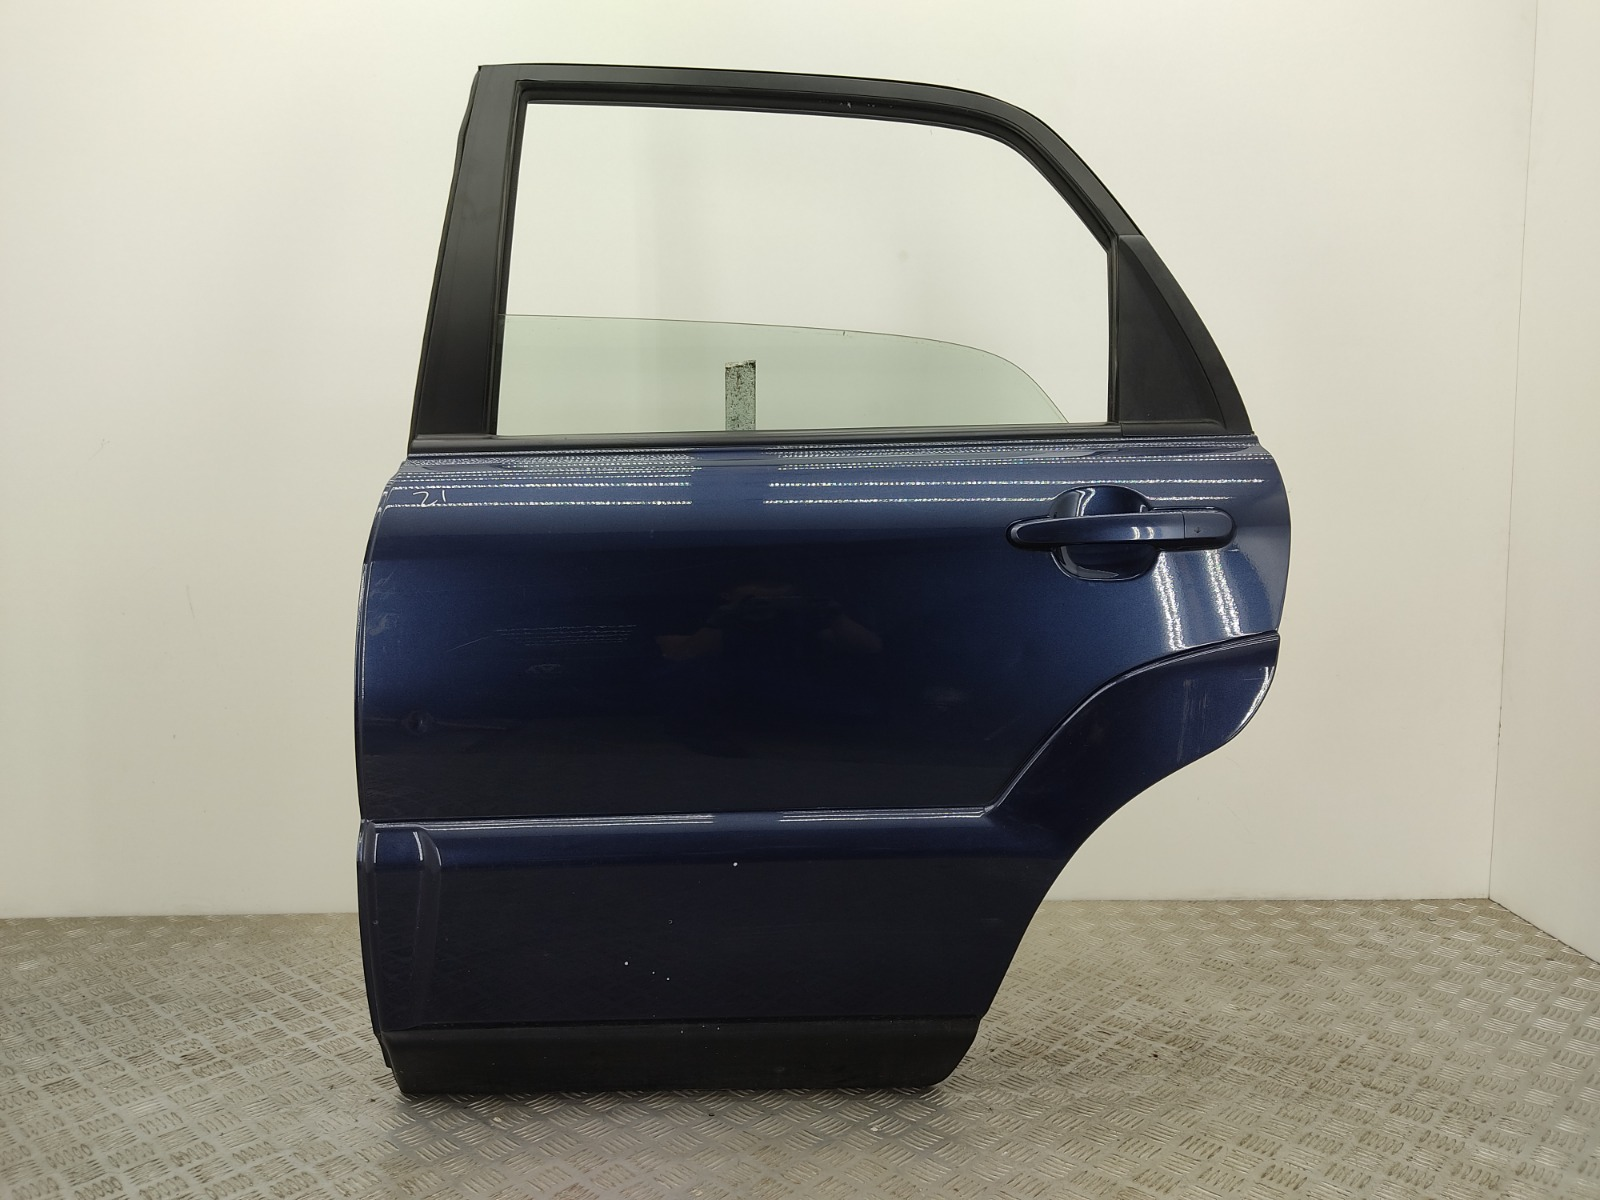 Дверь задняя левая Kia Sportage 2.0 CRDI 2009 (б/у)